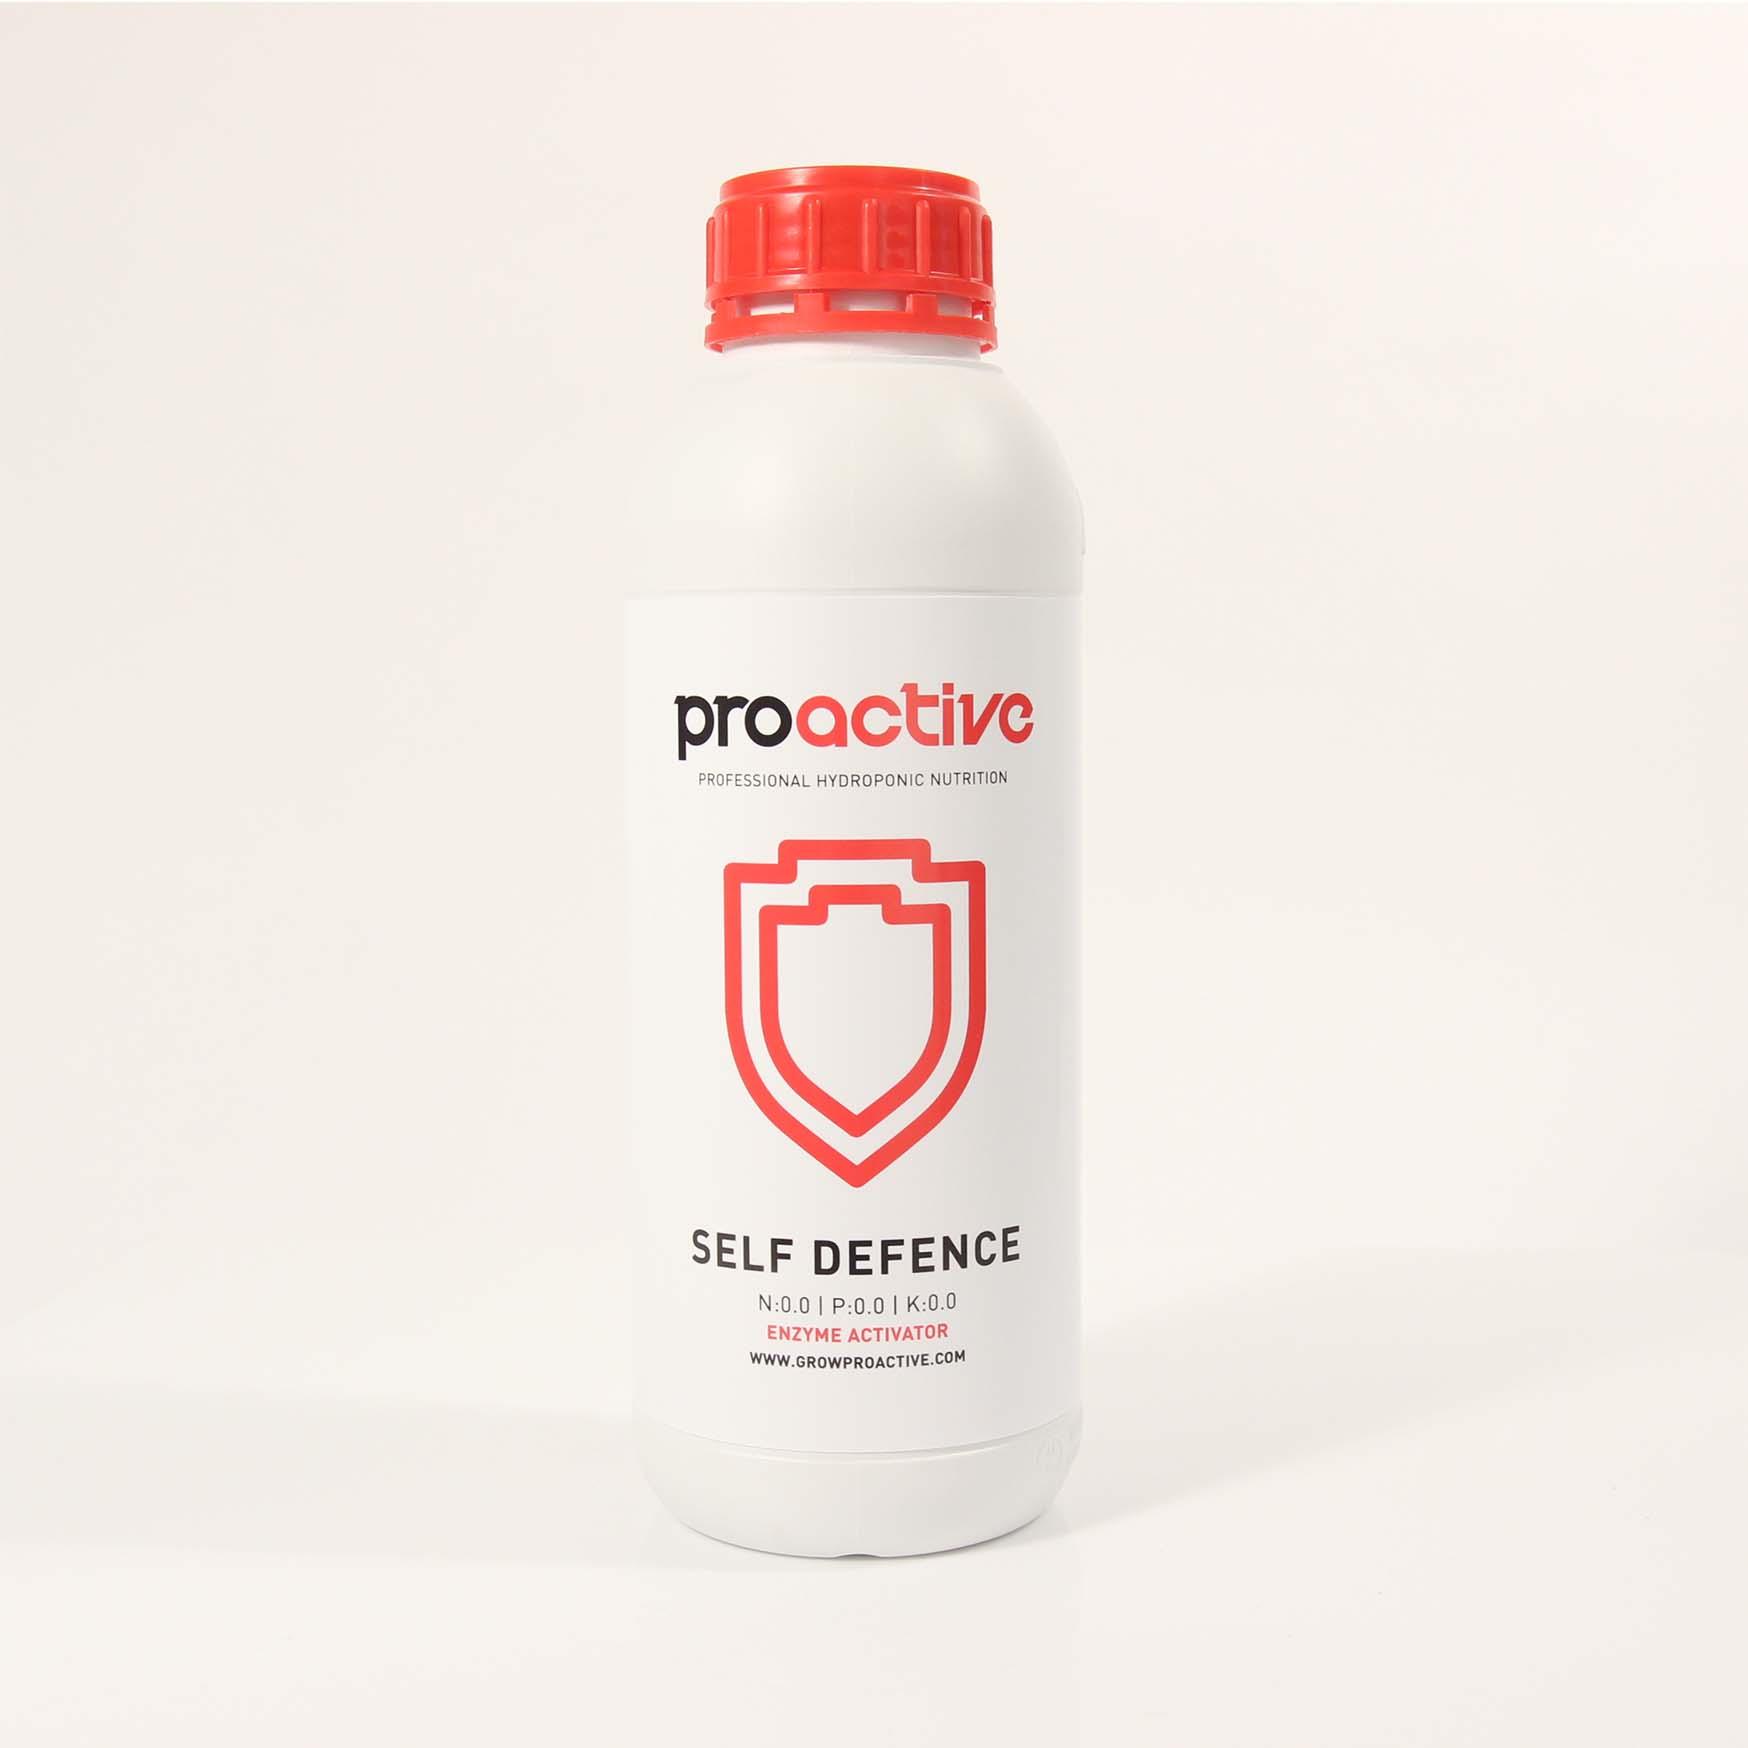 Jeff Winterborne's Proactive Hydroponics Self Defense Additive